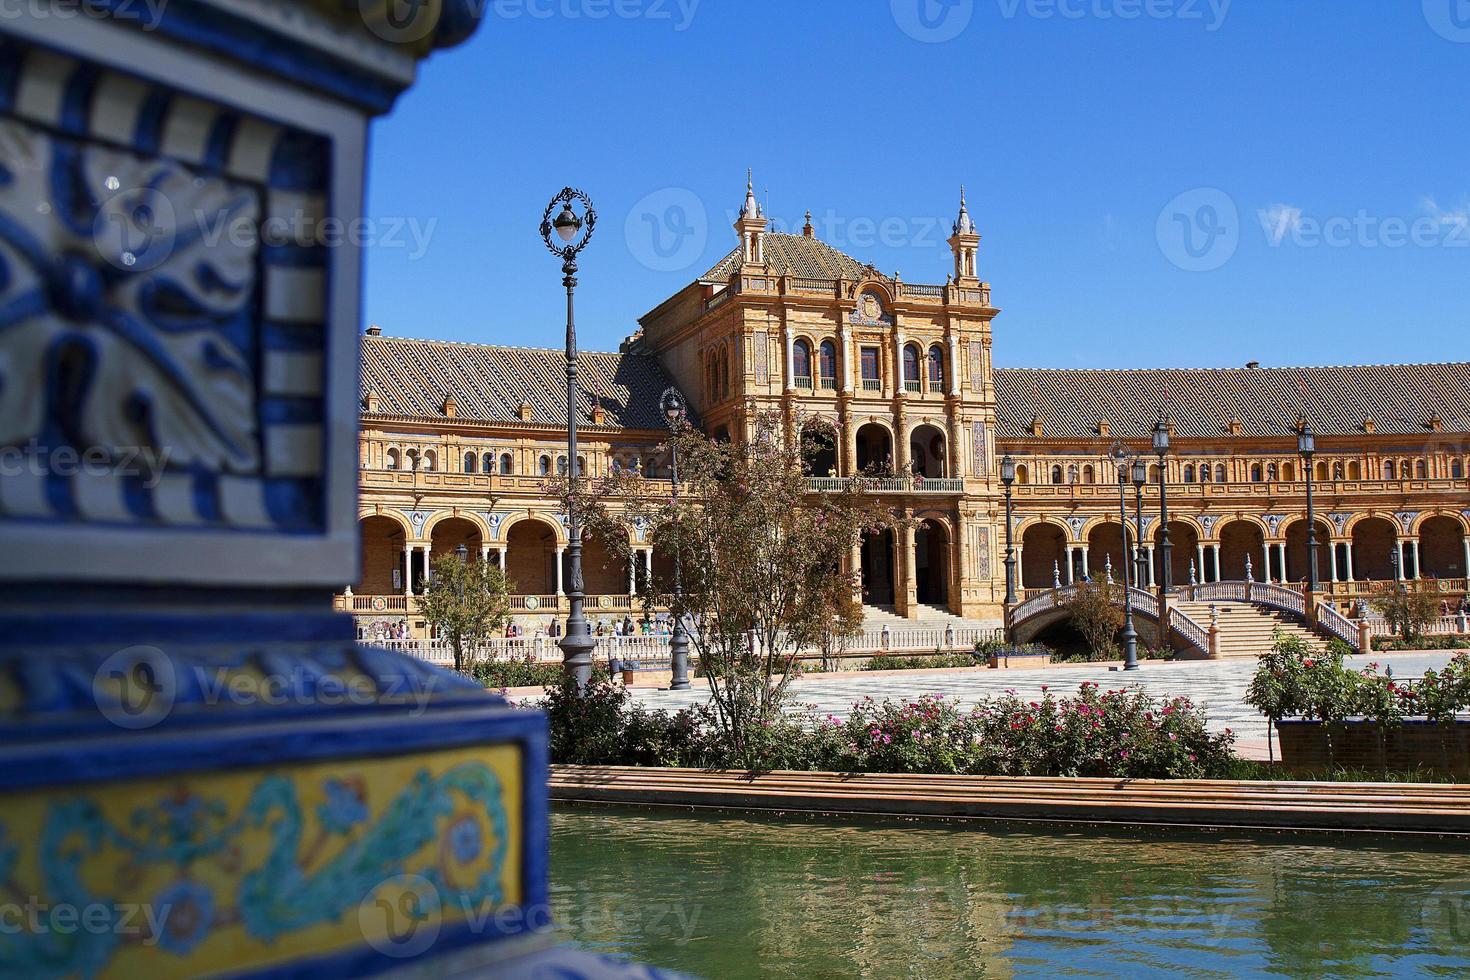 Palace and ceramics in Plaza de España, Seville. photo